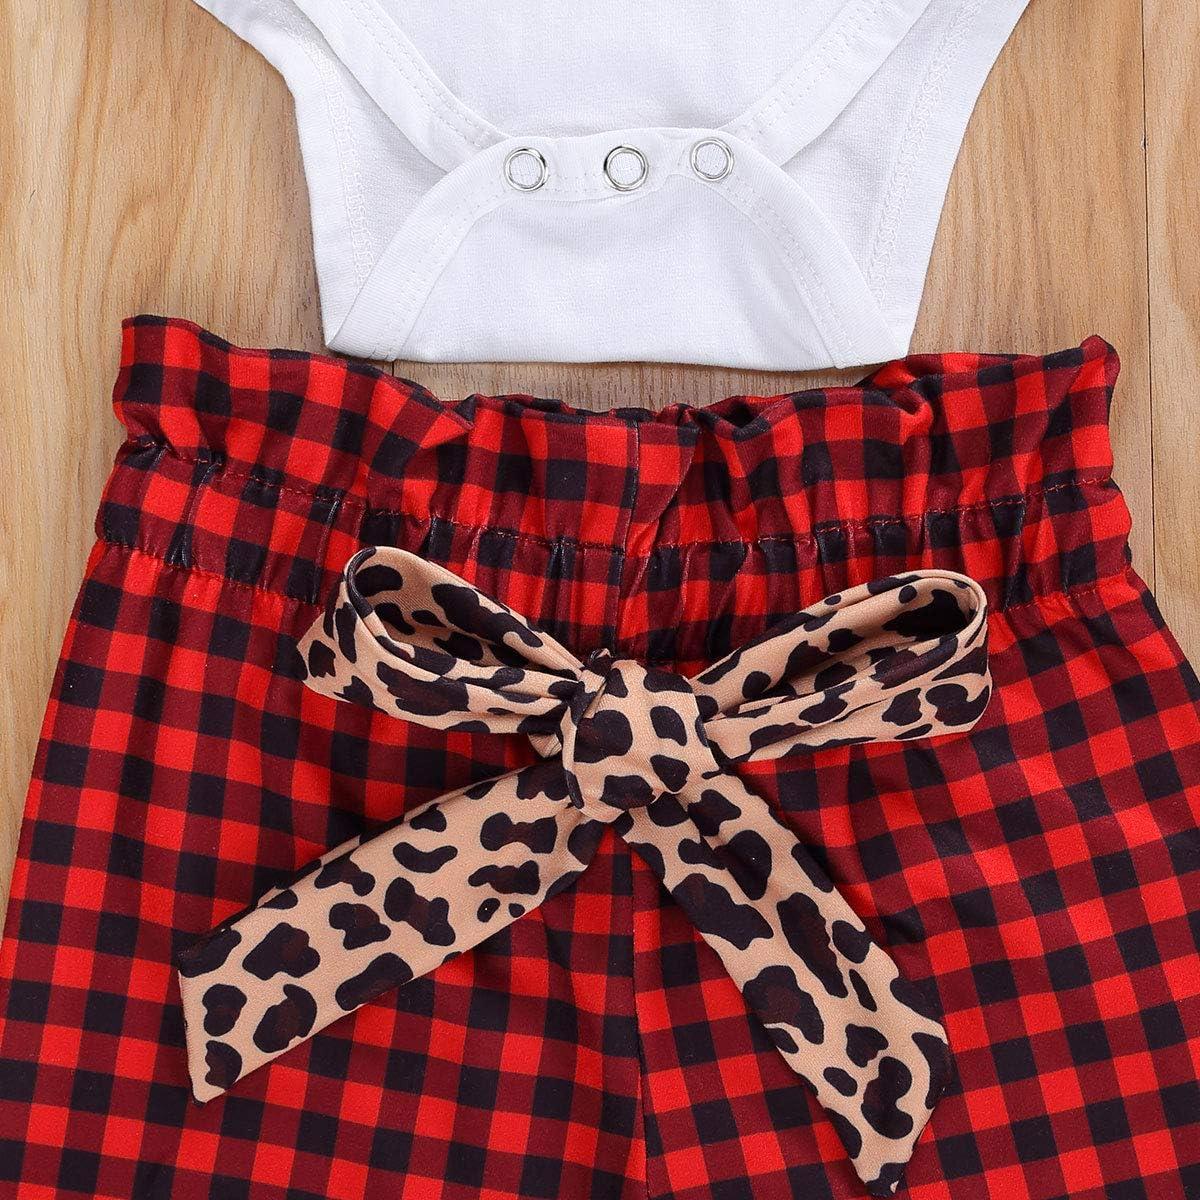 Newborn Baby Girls Christmas Outfits My First Christmas Romper Top Plaid/Leopard Pants Pajamas Headband Set